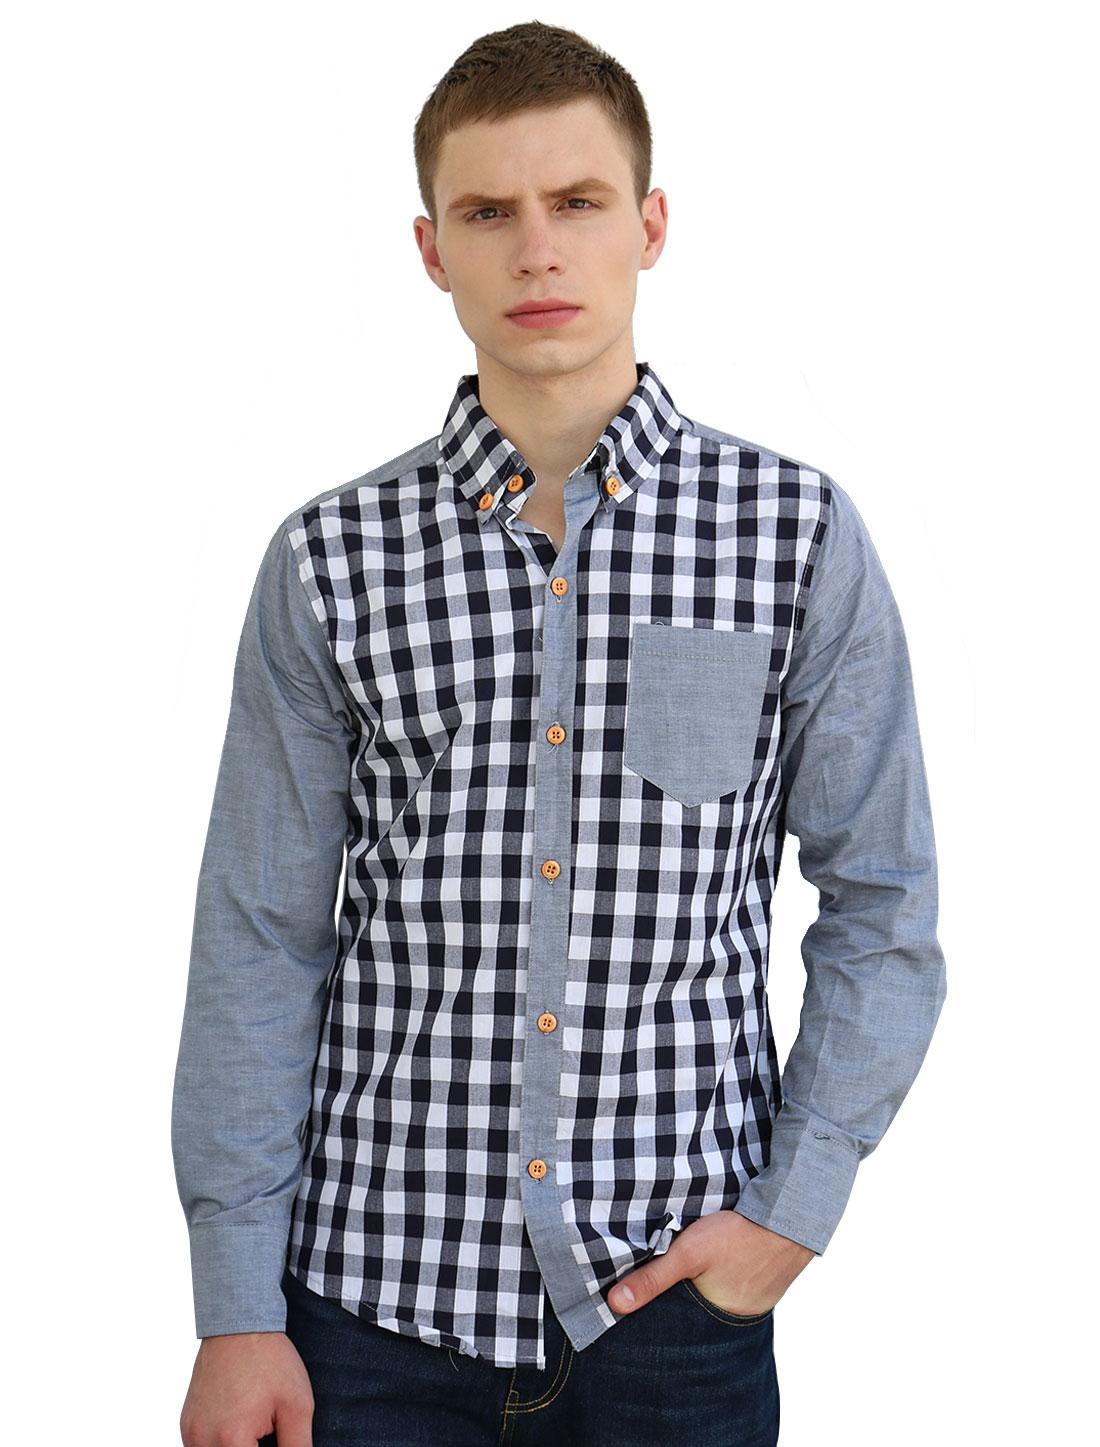 Men Point Collar Long Sleeve Plaid Flannel Shirt Light Gray S